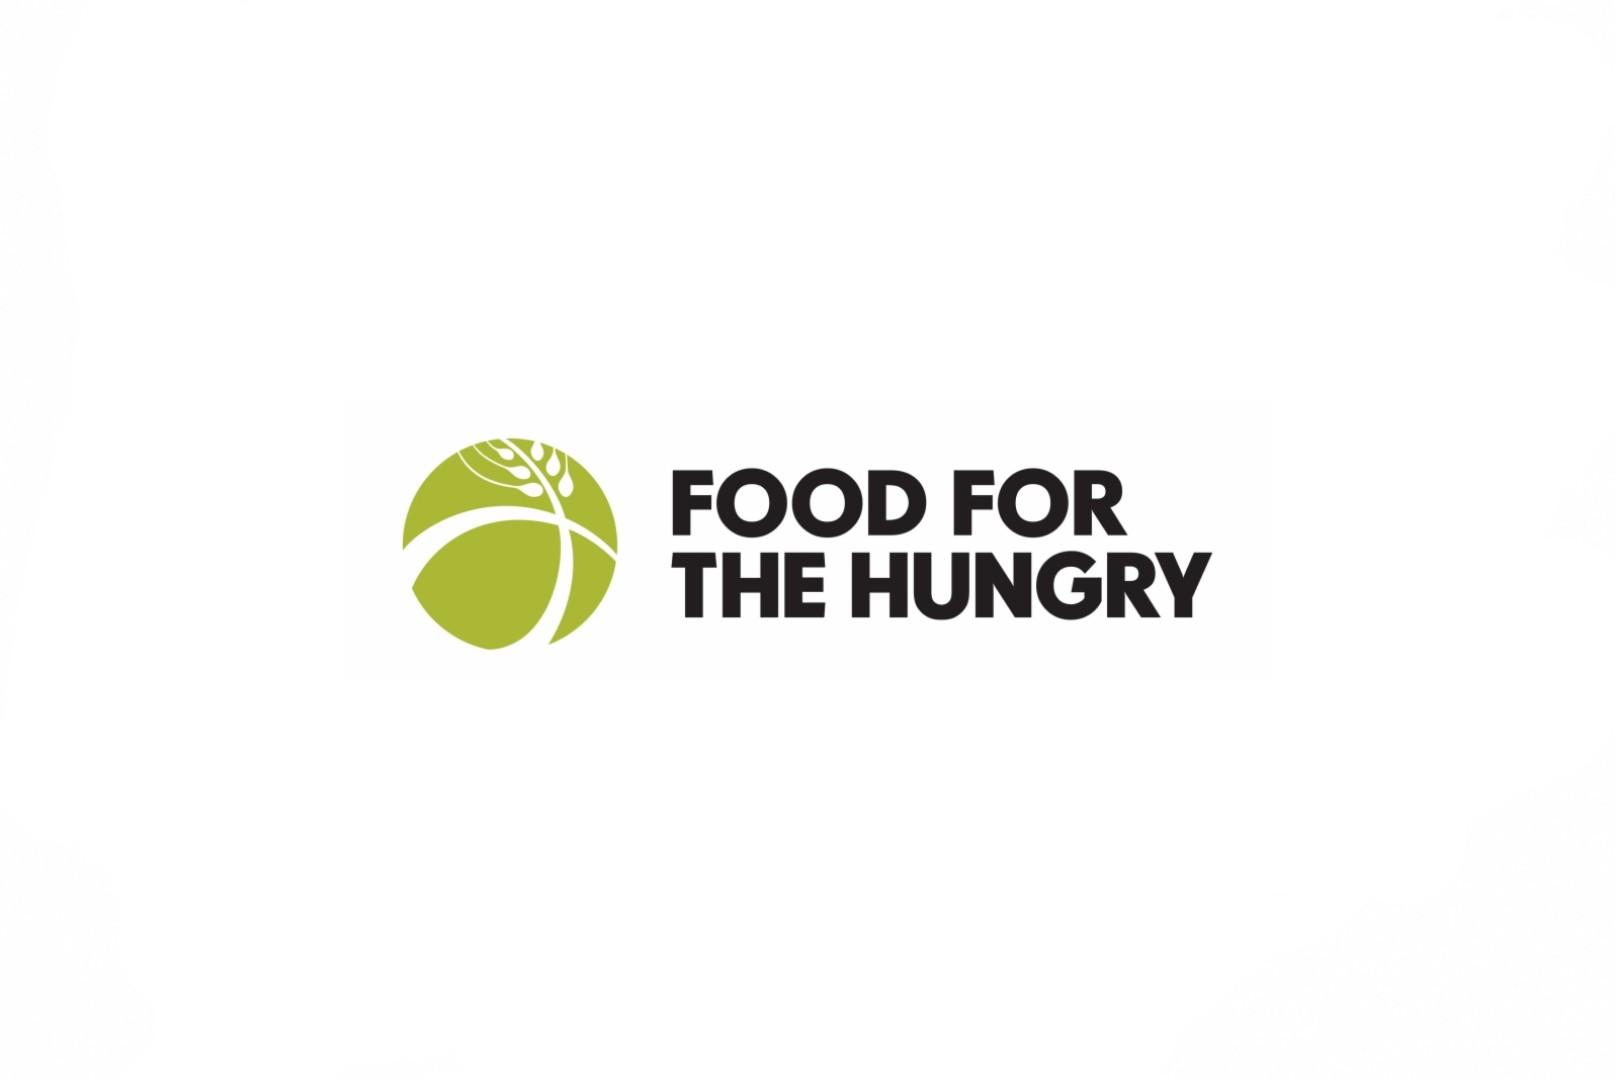 Sovagasmoz _ FOOD FOR THE HUNGRY Association_Emprego